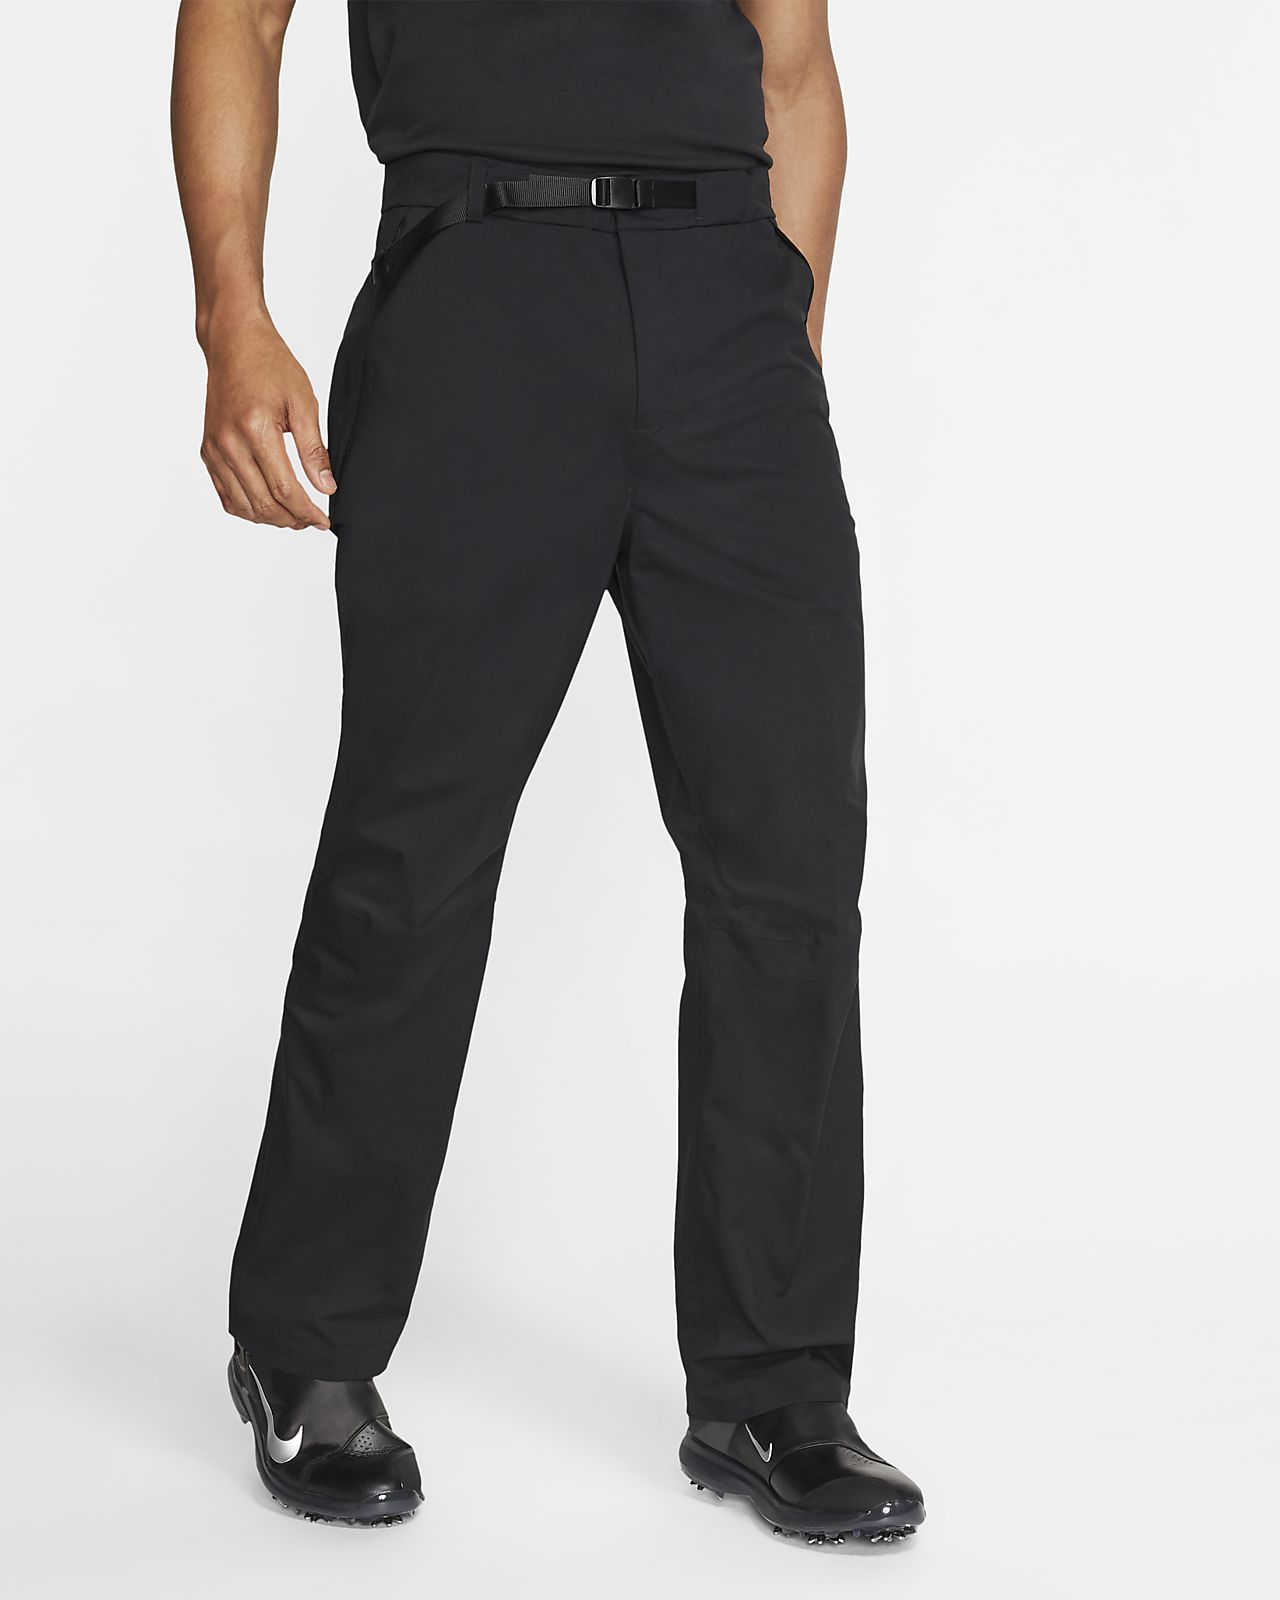 Pantaloni da golf Nike HyperShield - Uomo